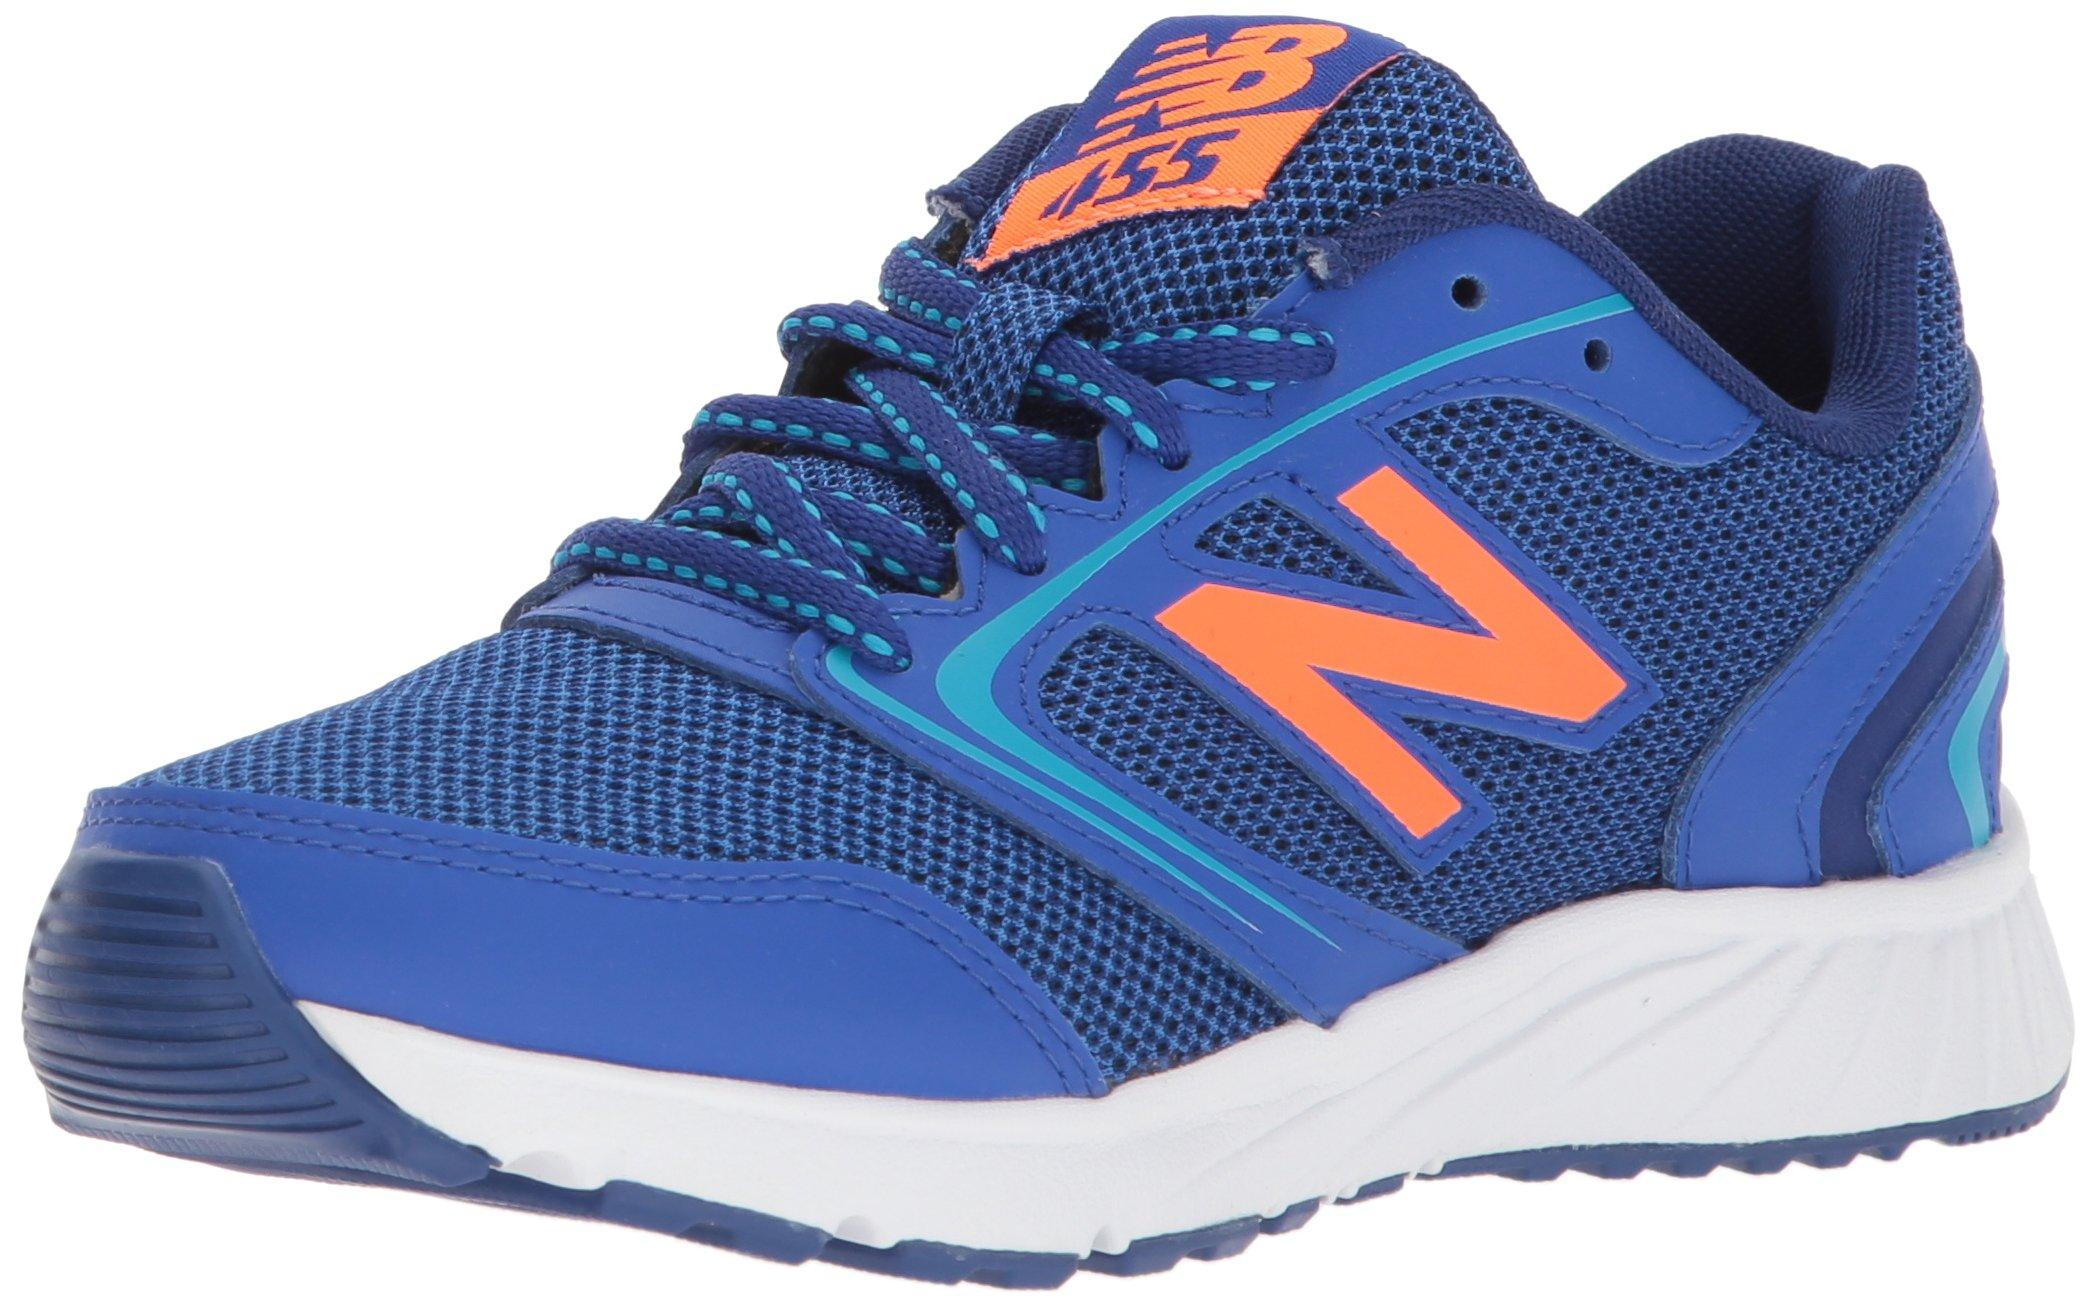 New Balance Boys' 455v1 Running Shoe, Pacific/Dynomite, 1.5 W US Little Kid